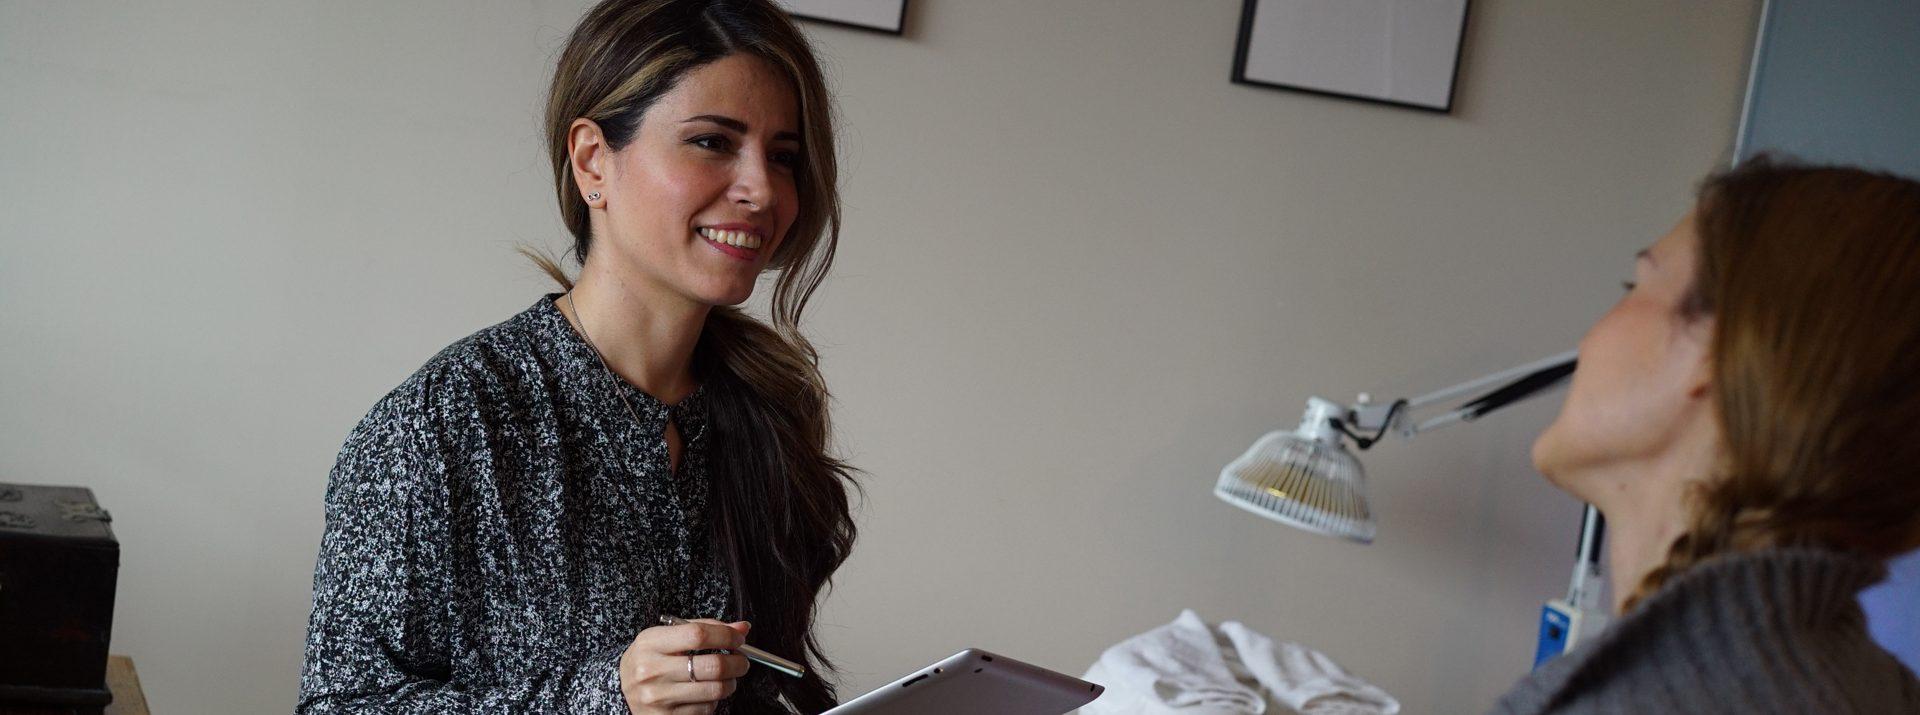 Mahsa Ahmedi Treating Patients